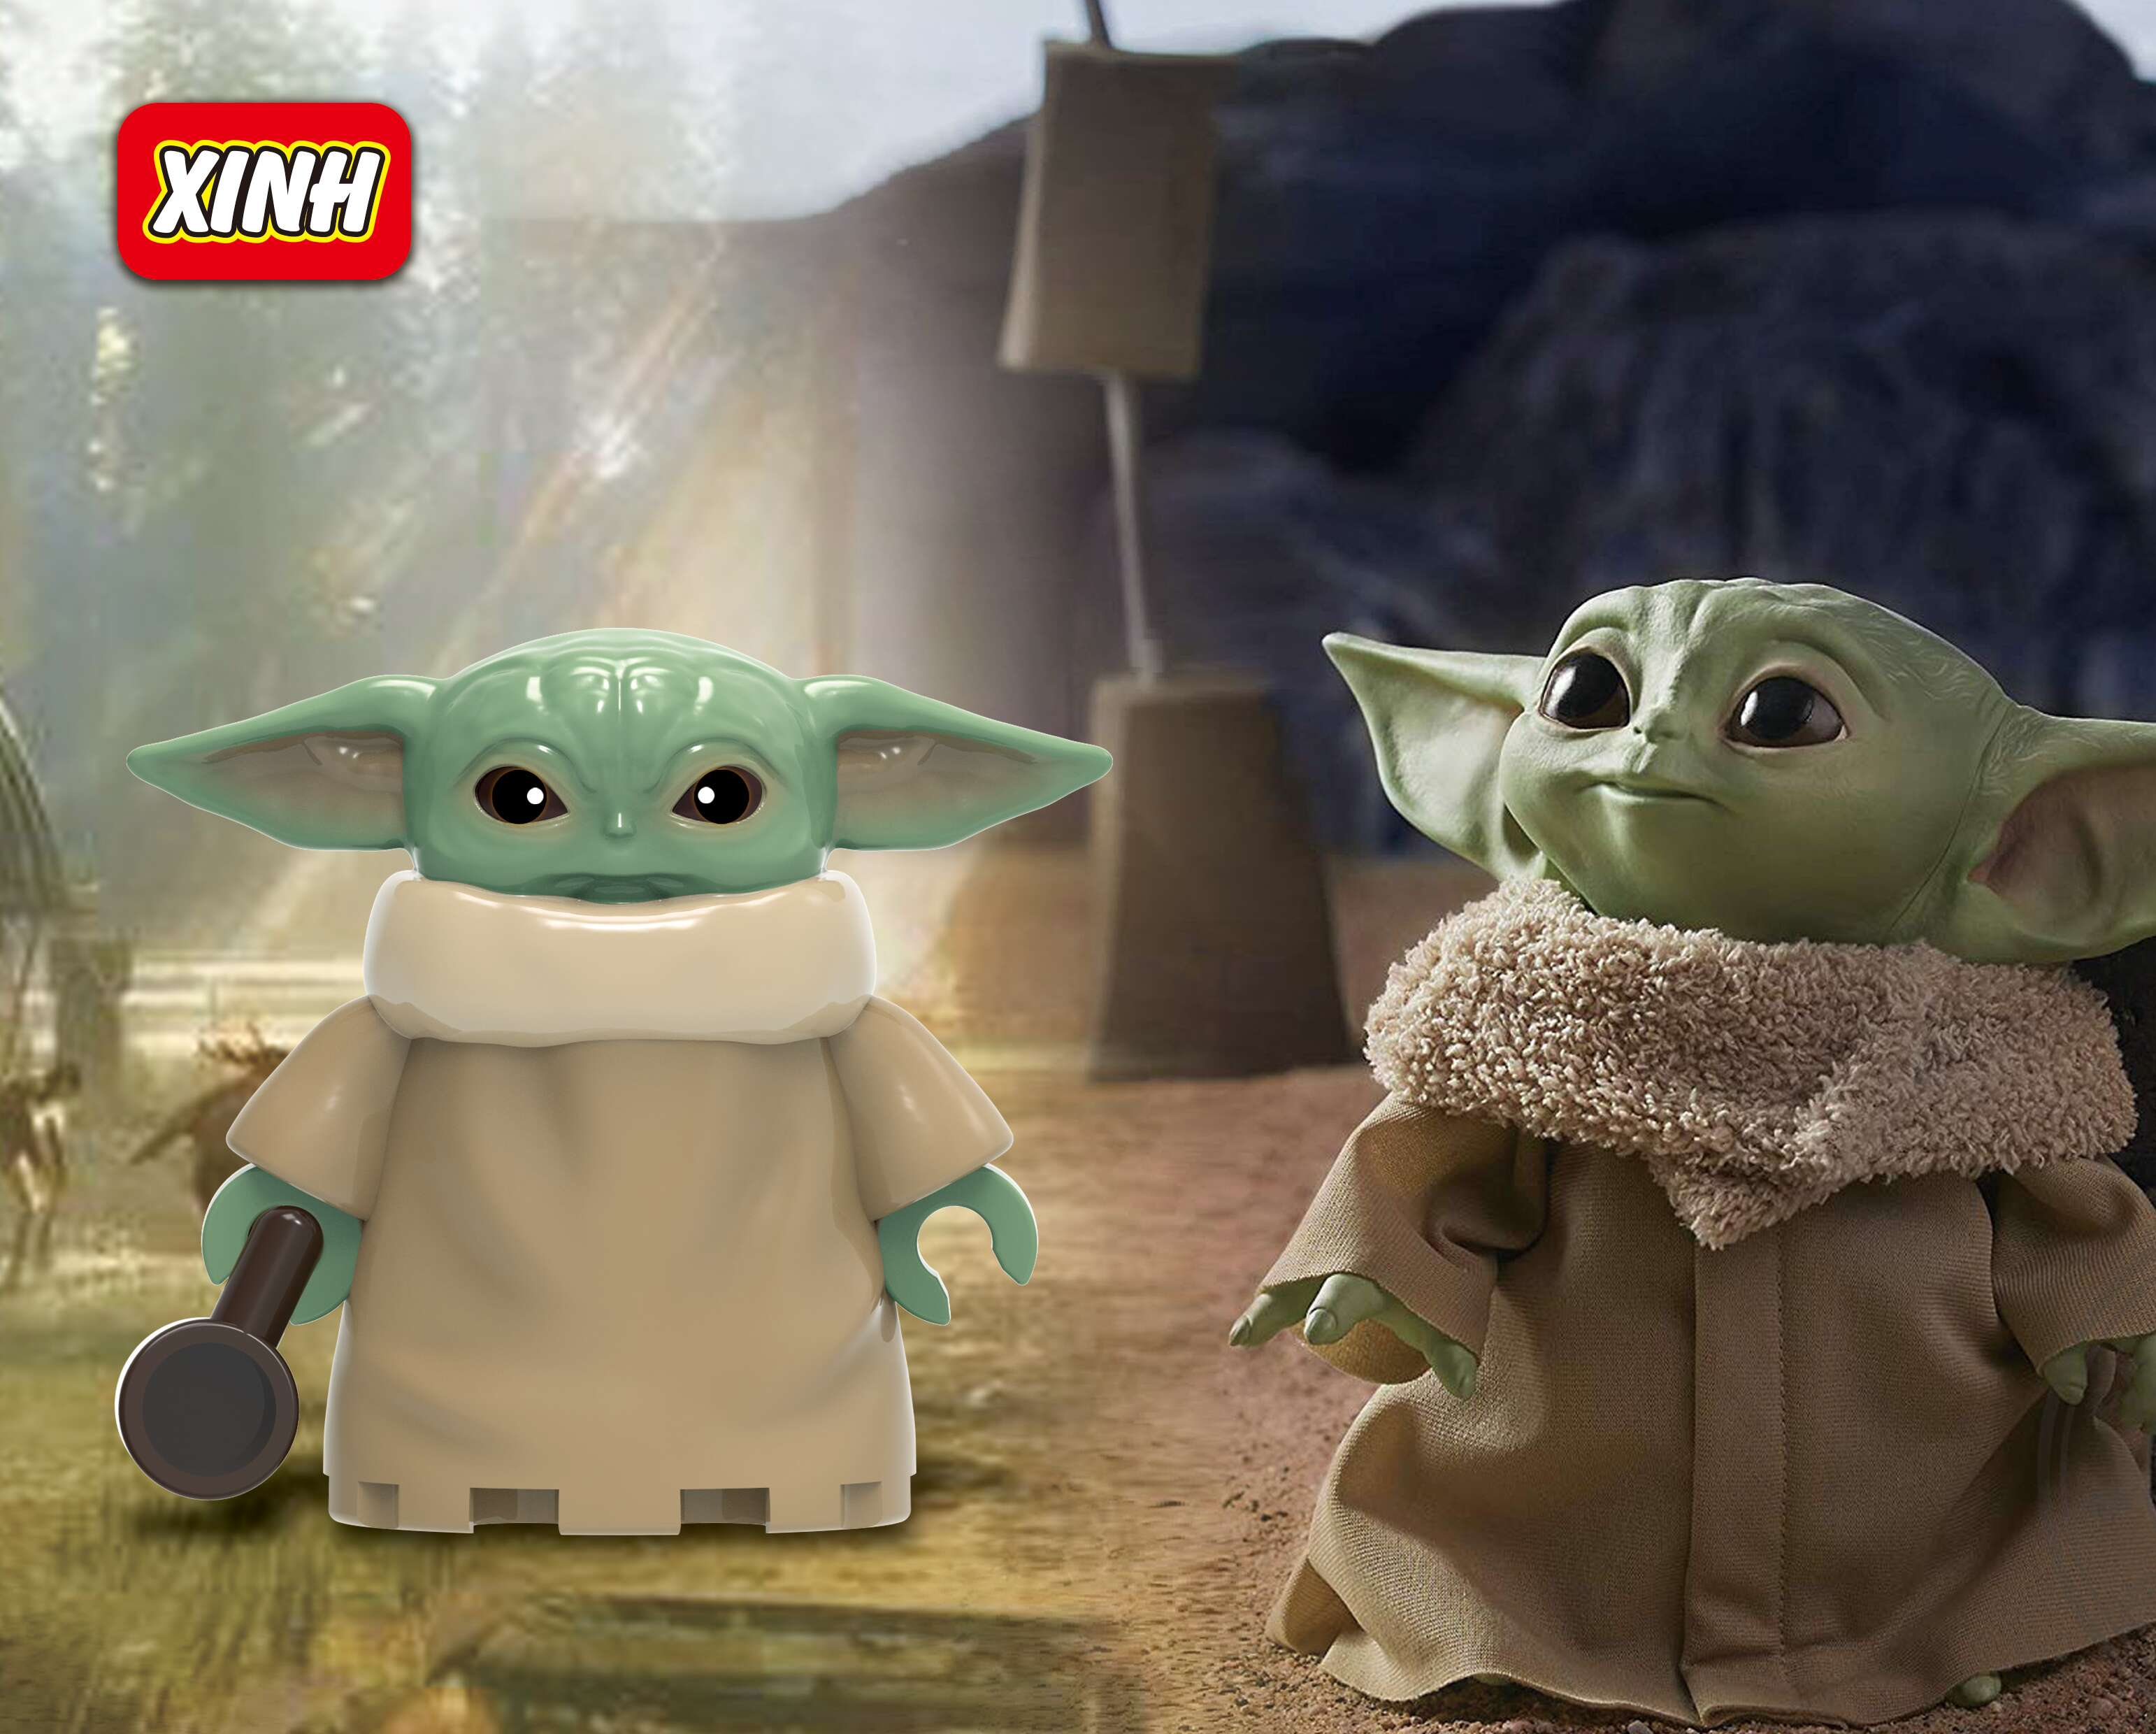 Baby Yoda  StarwarsThe Mandalorian Ray Empire Robot Knights Of Ren WM6085 Building Blocks Figures Toys For Children XH 1533